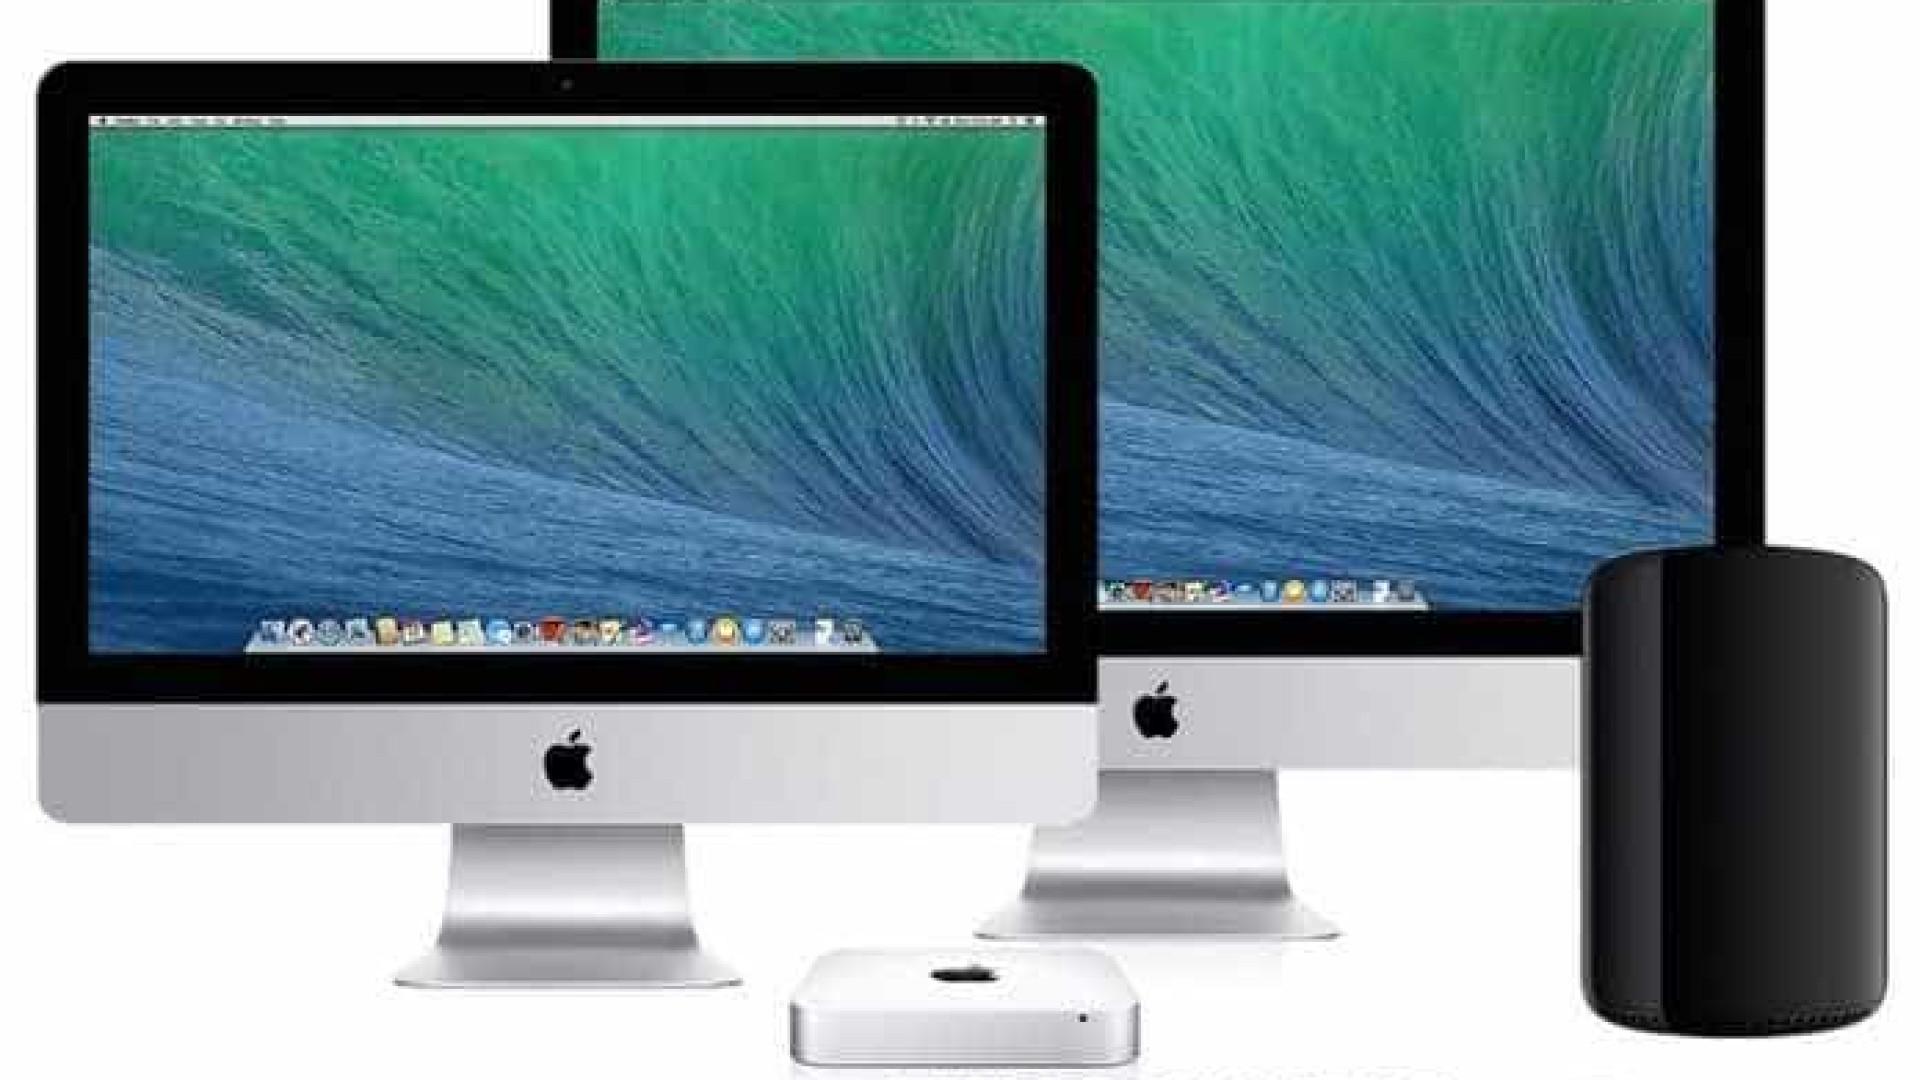 Novo iMac Pro pode chegar a custar R$ 98 mil no Brasil